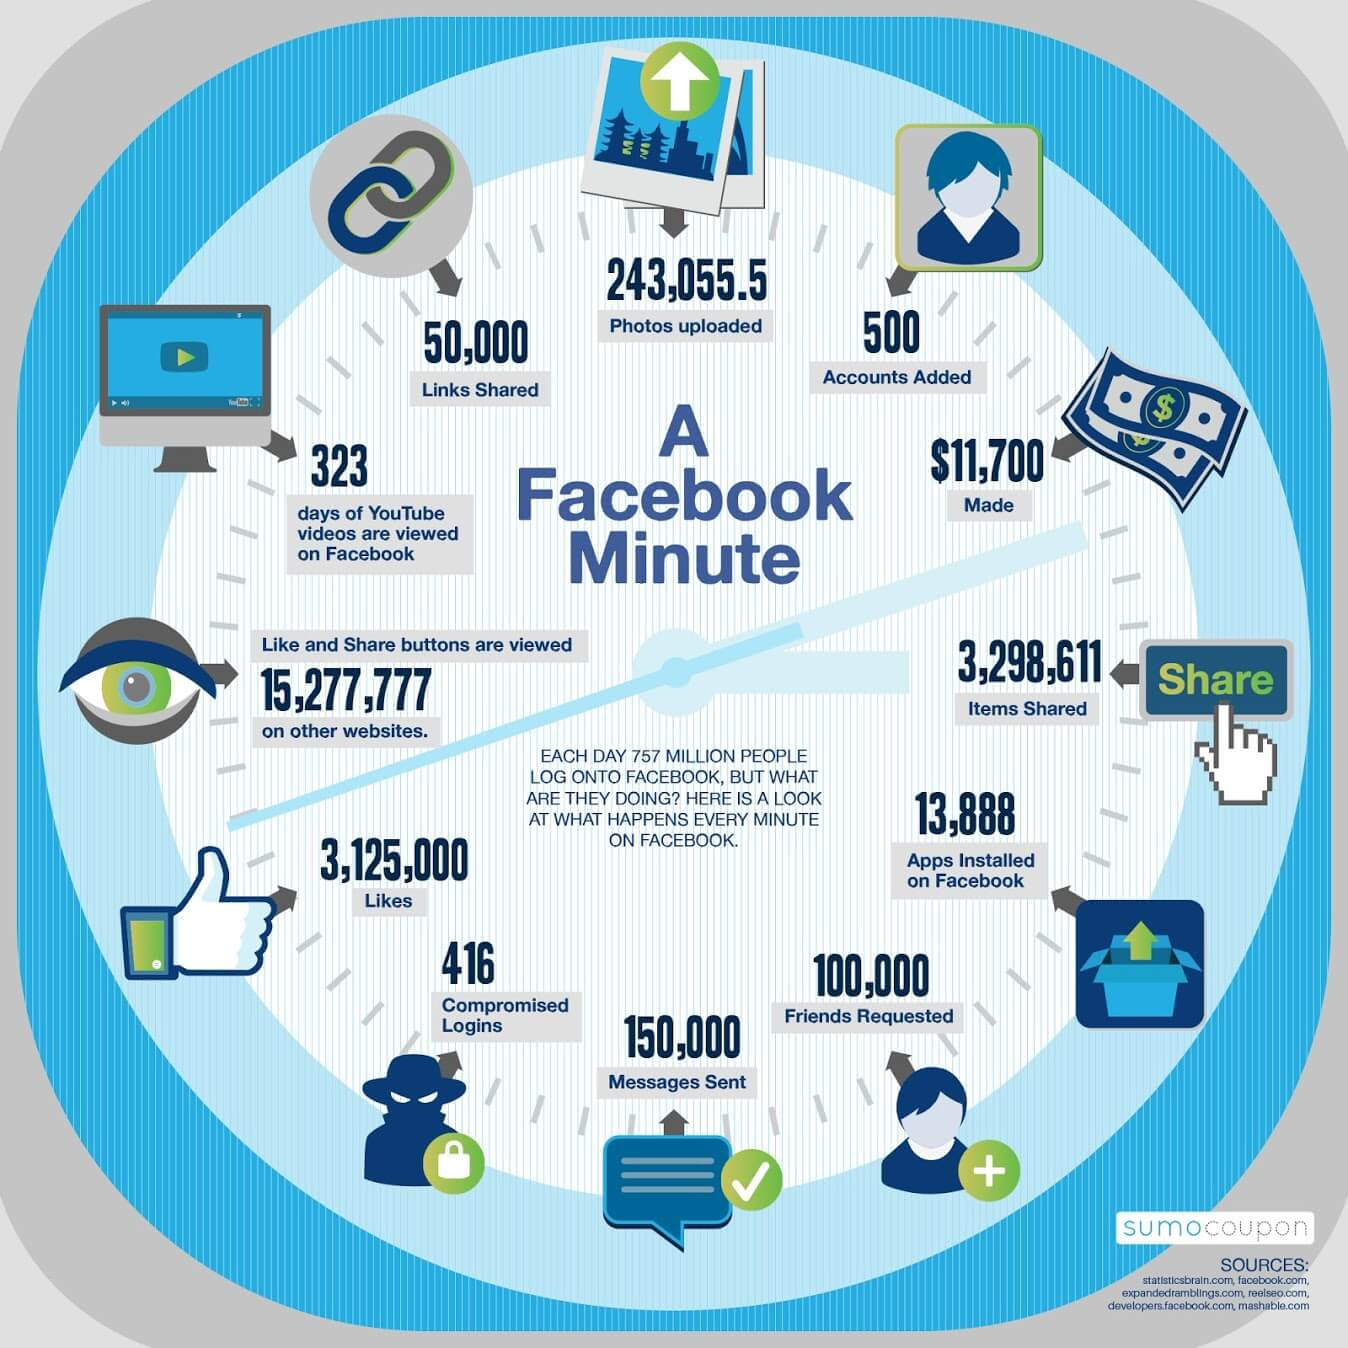 wat gebeurt er in 1 minuut op Facebook